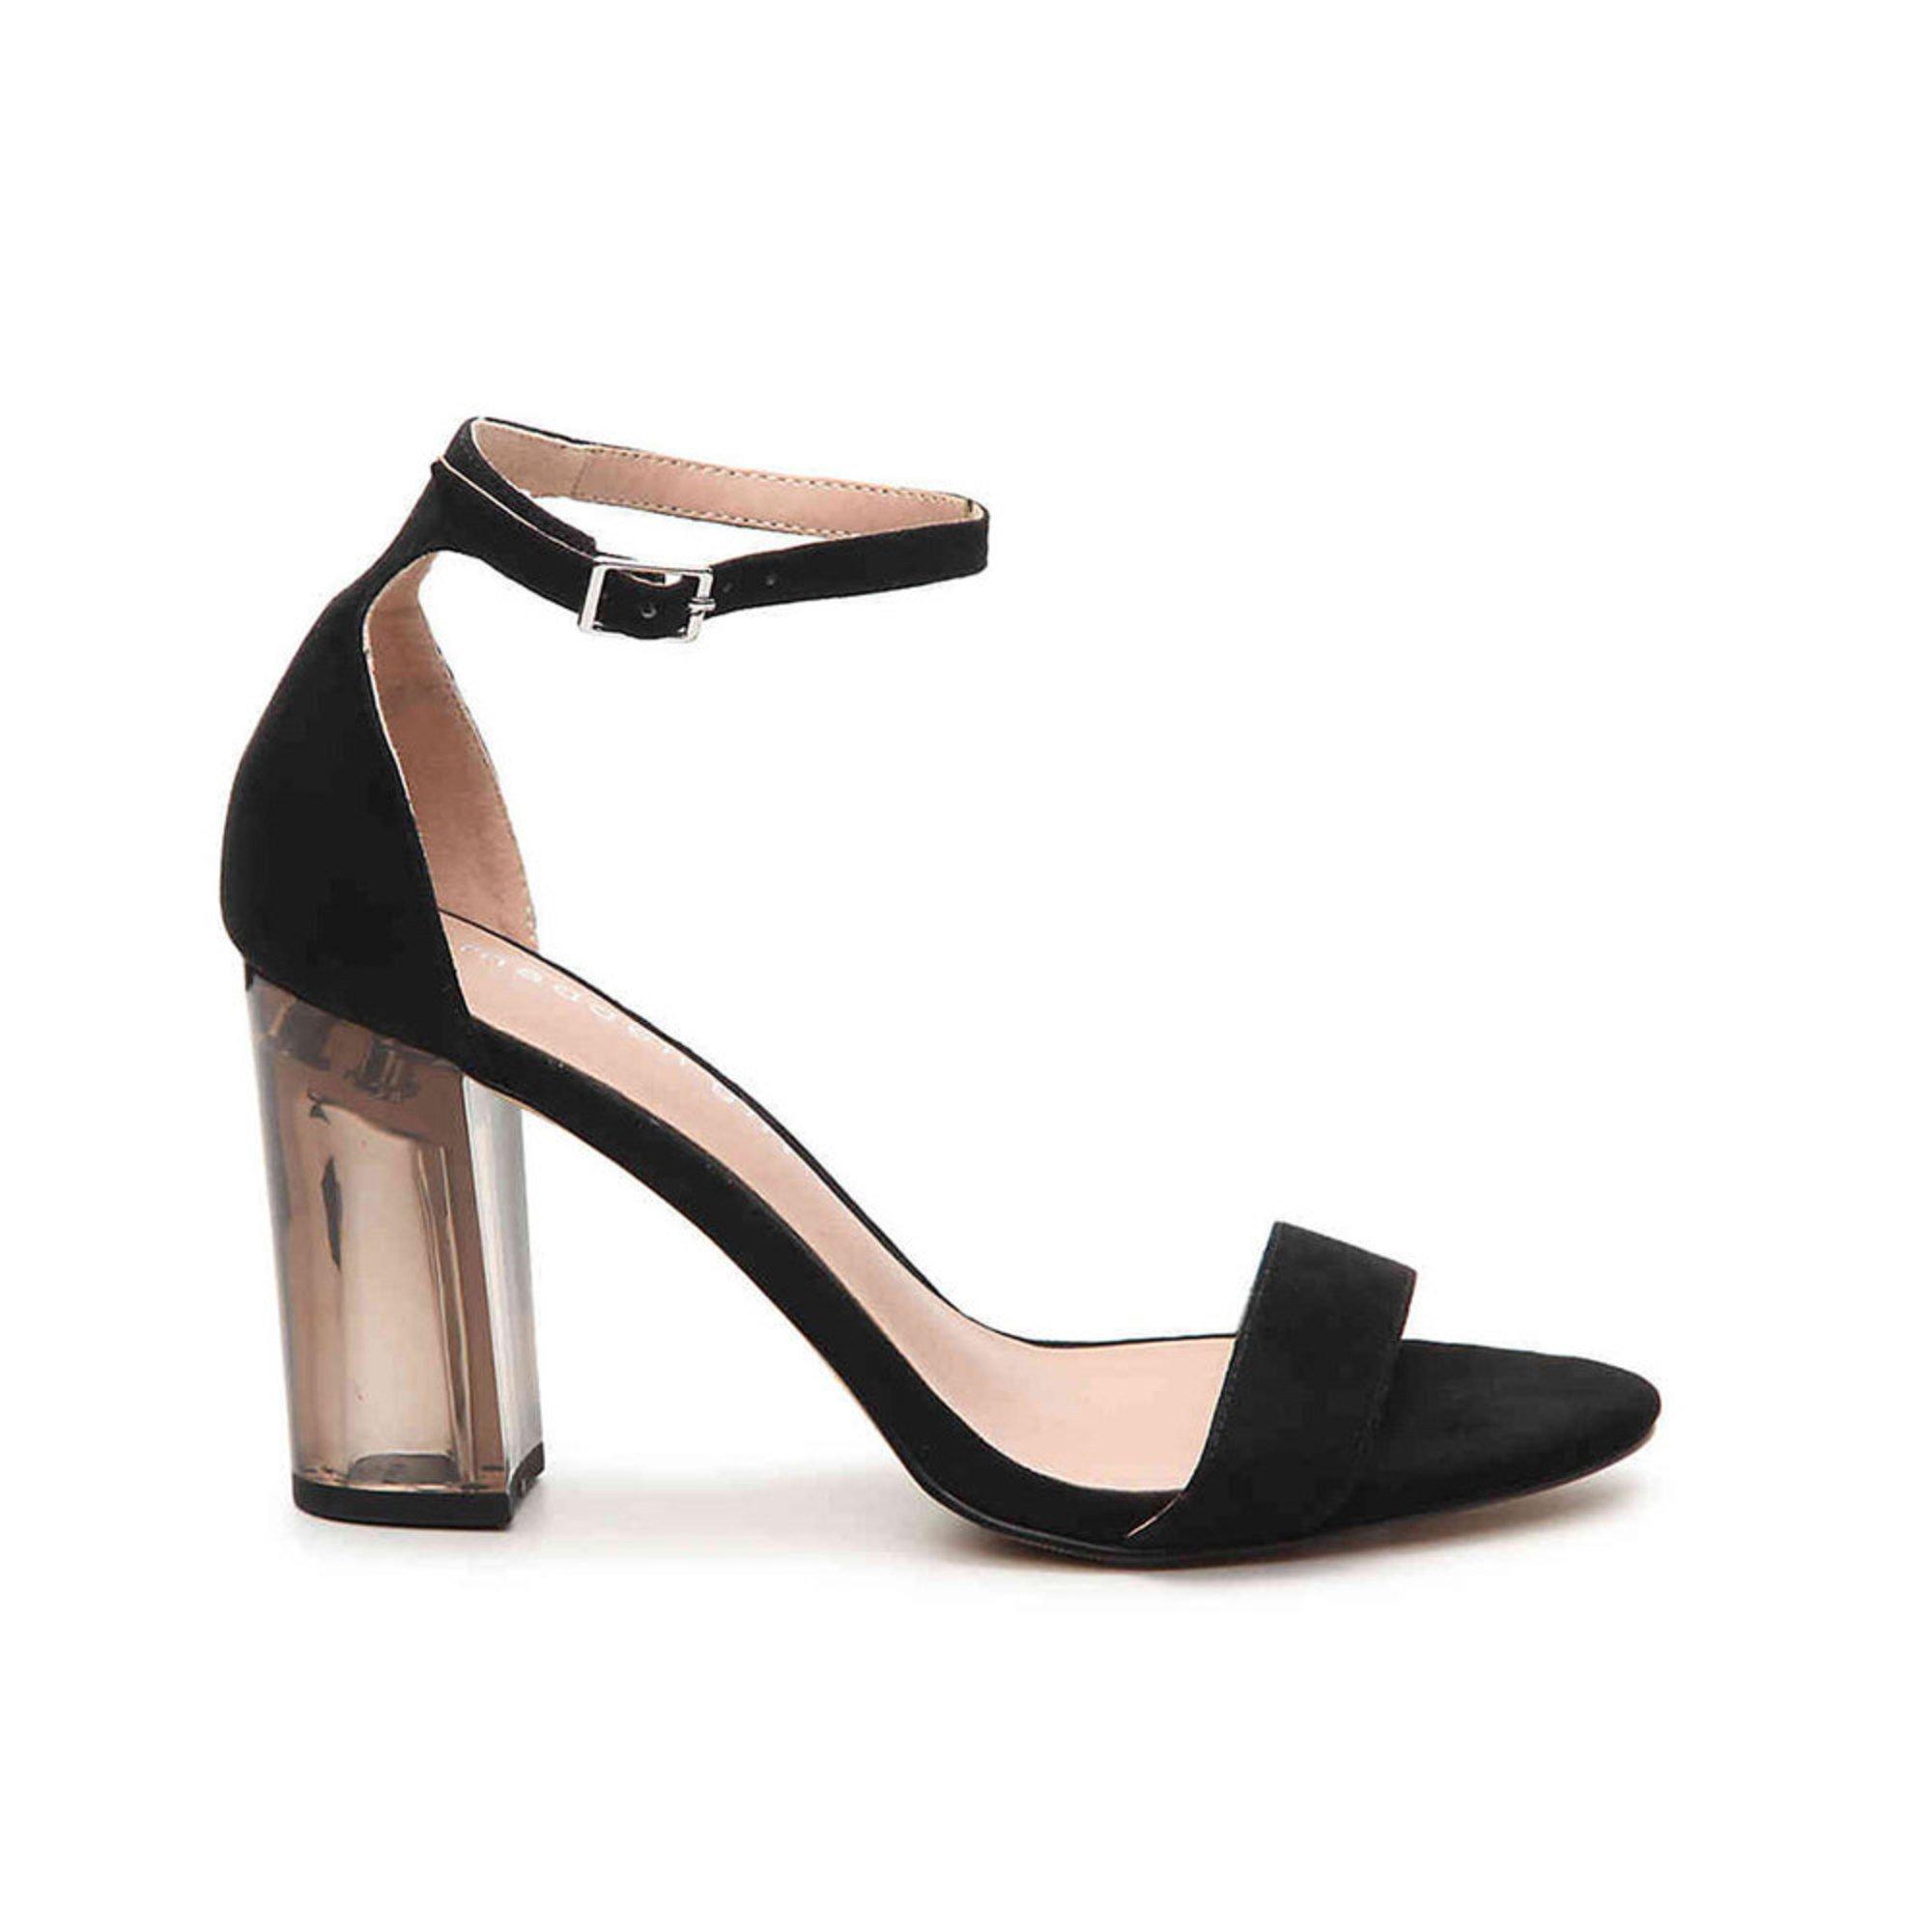 8ecbf826777 Madden Girl. Madden Girl Women s Bella 2 Piece Mid Heel Dress Sandal